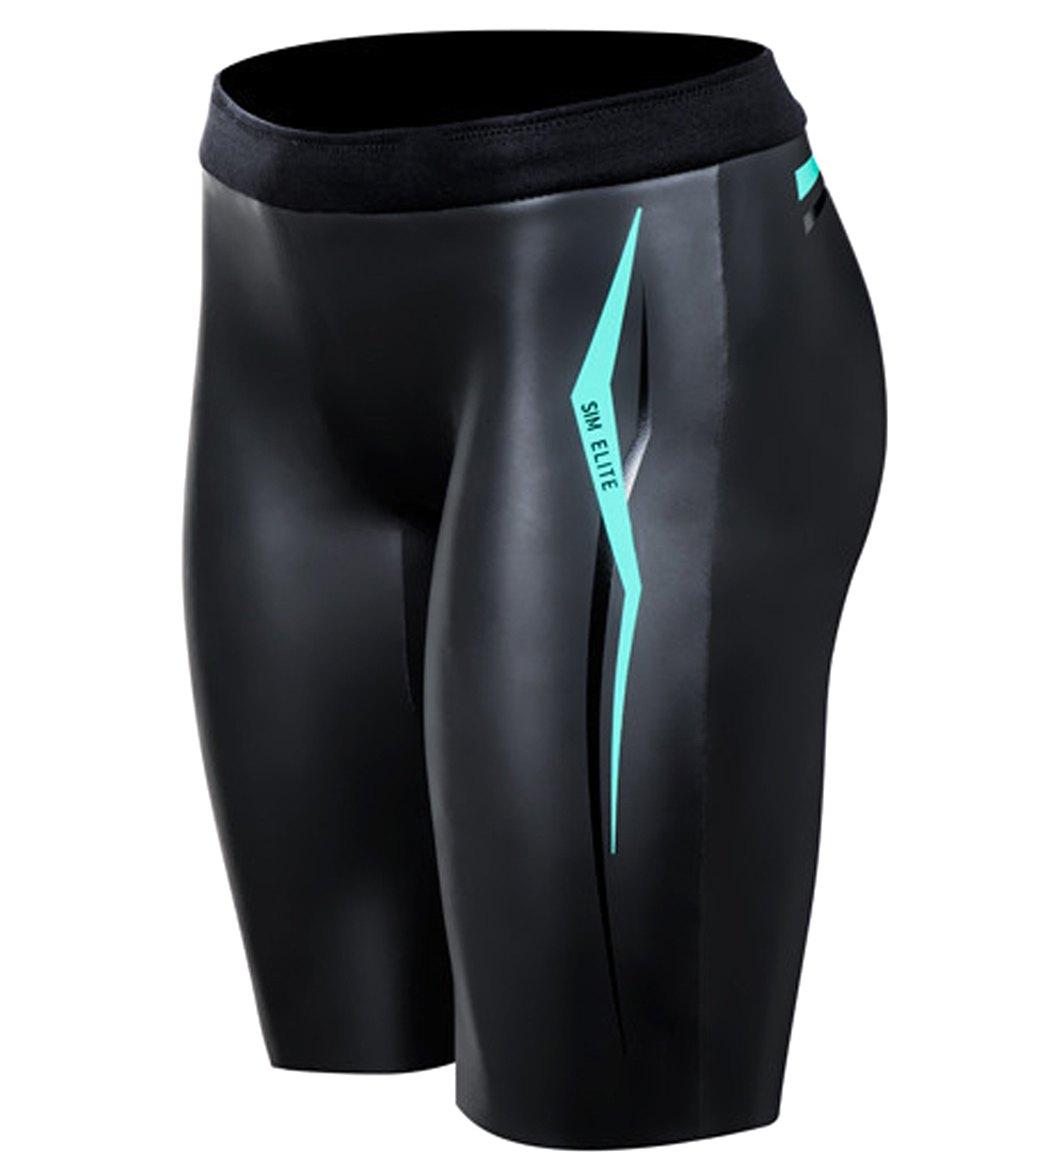 e9771463c1 ROKA Sports Women s SIM Elite II Neoprene Shorts at SwimOutlet.com - Free  Shipping